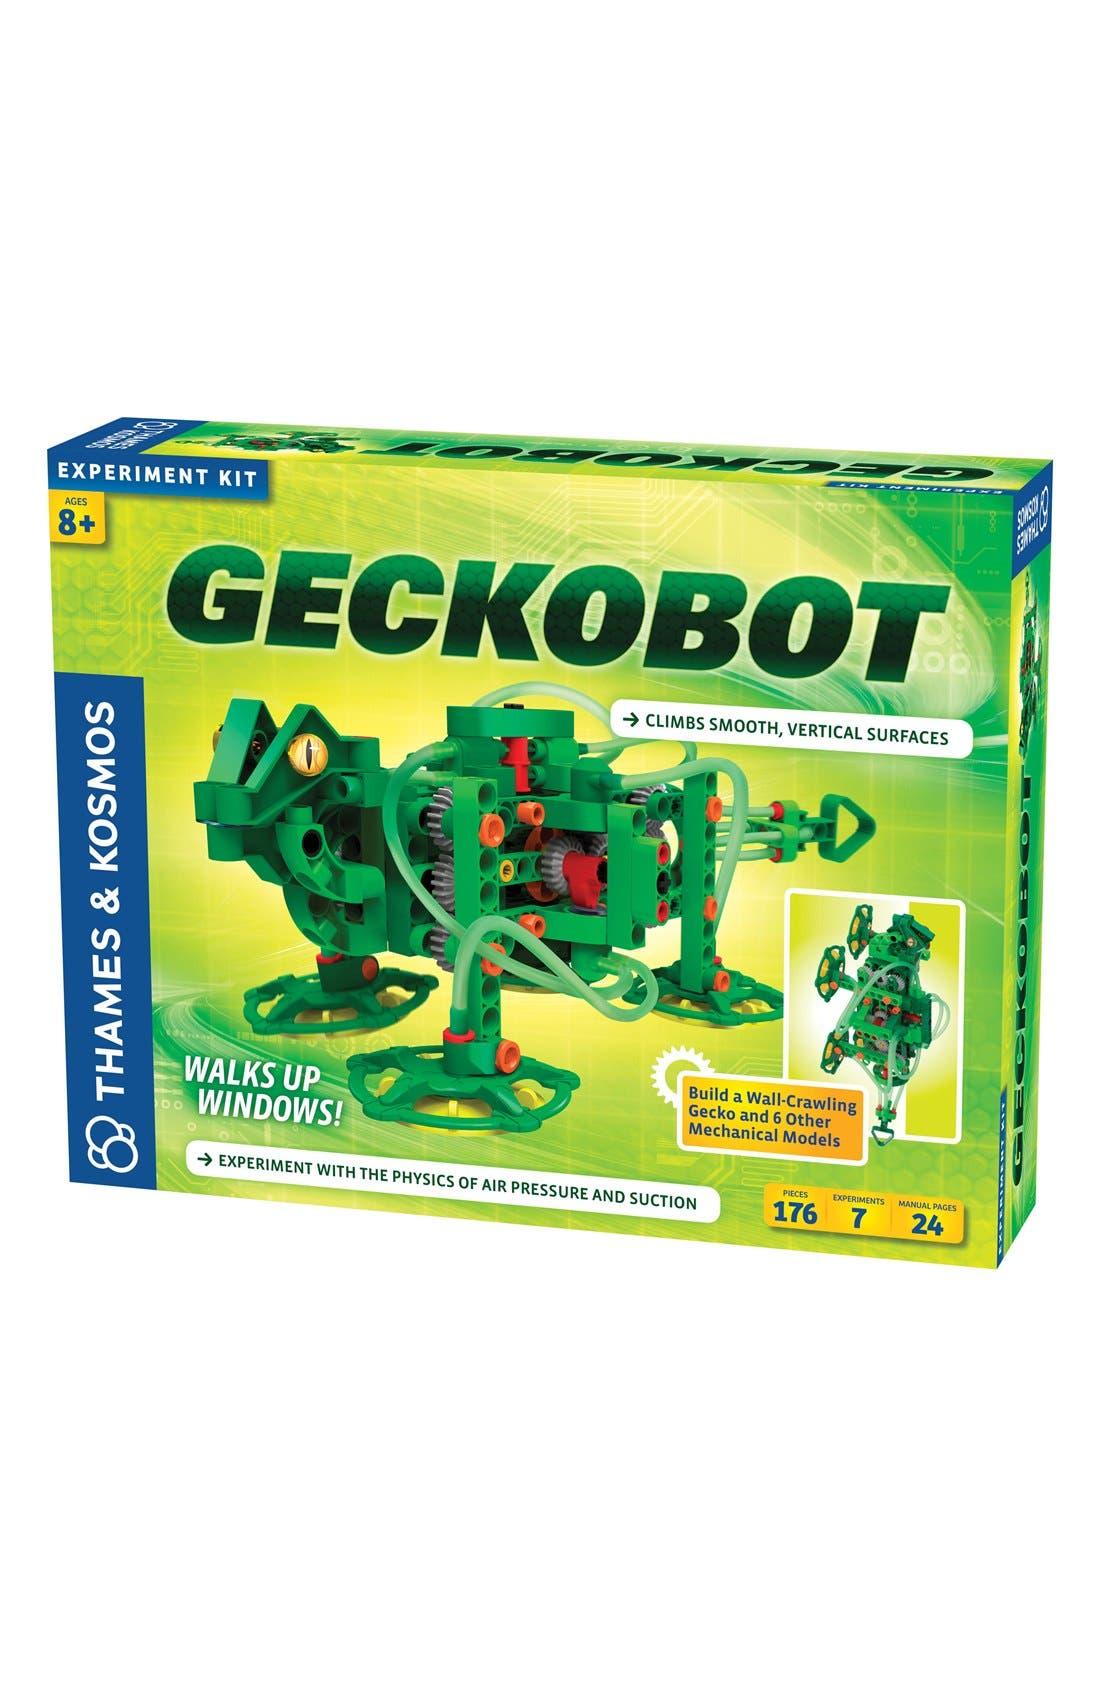 'Geckobot' Robotics Experiment Kit,                             Main thumbnail 1, color,                             301